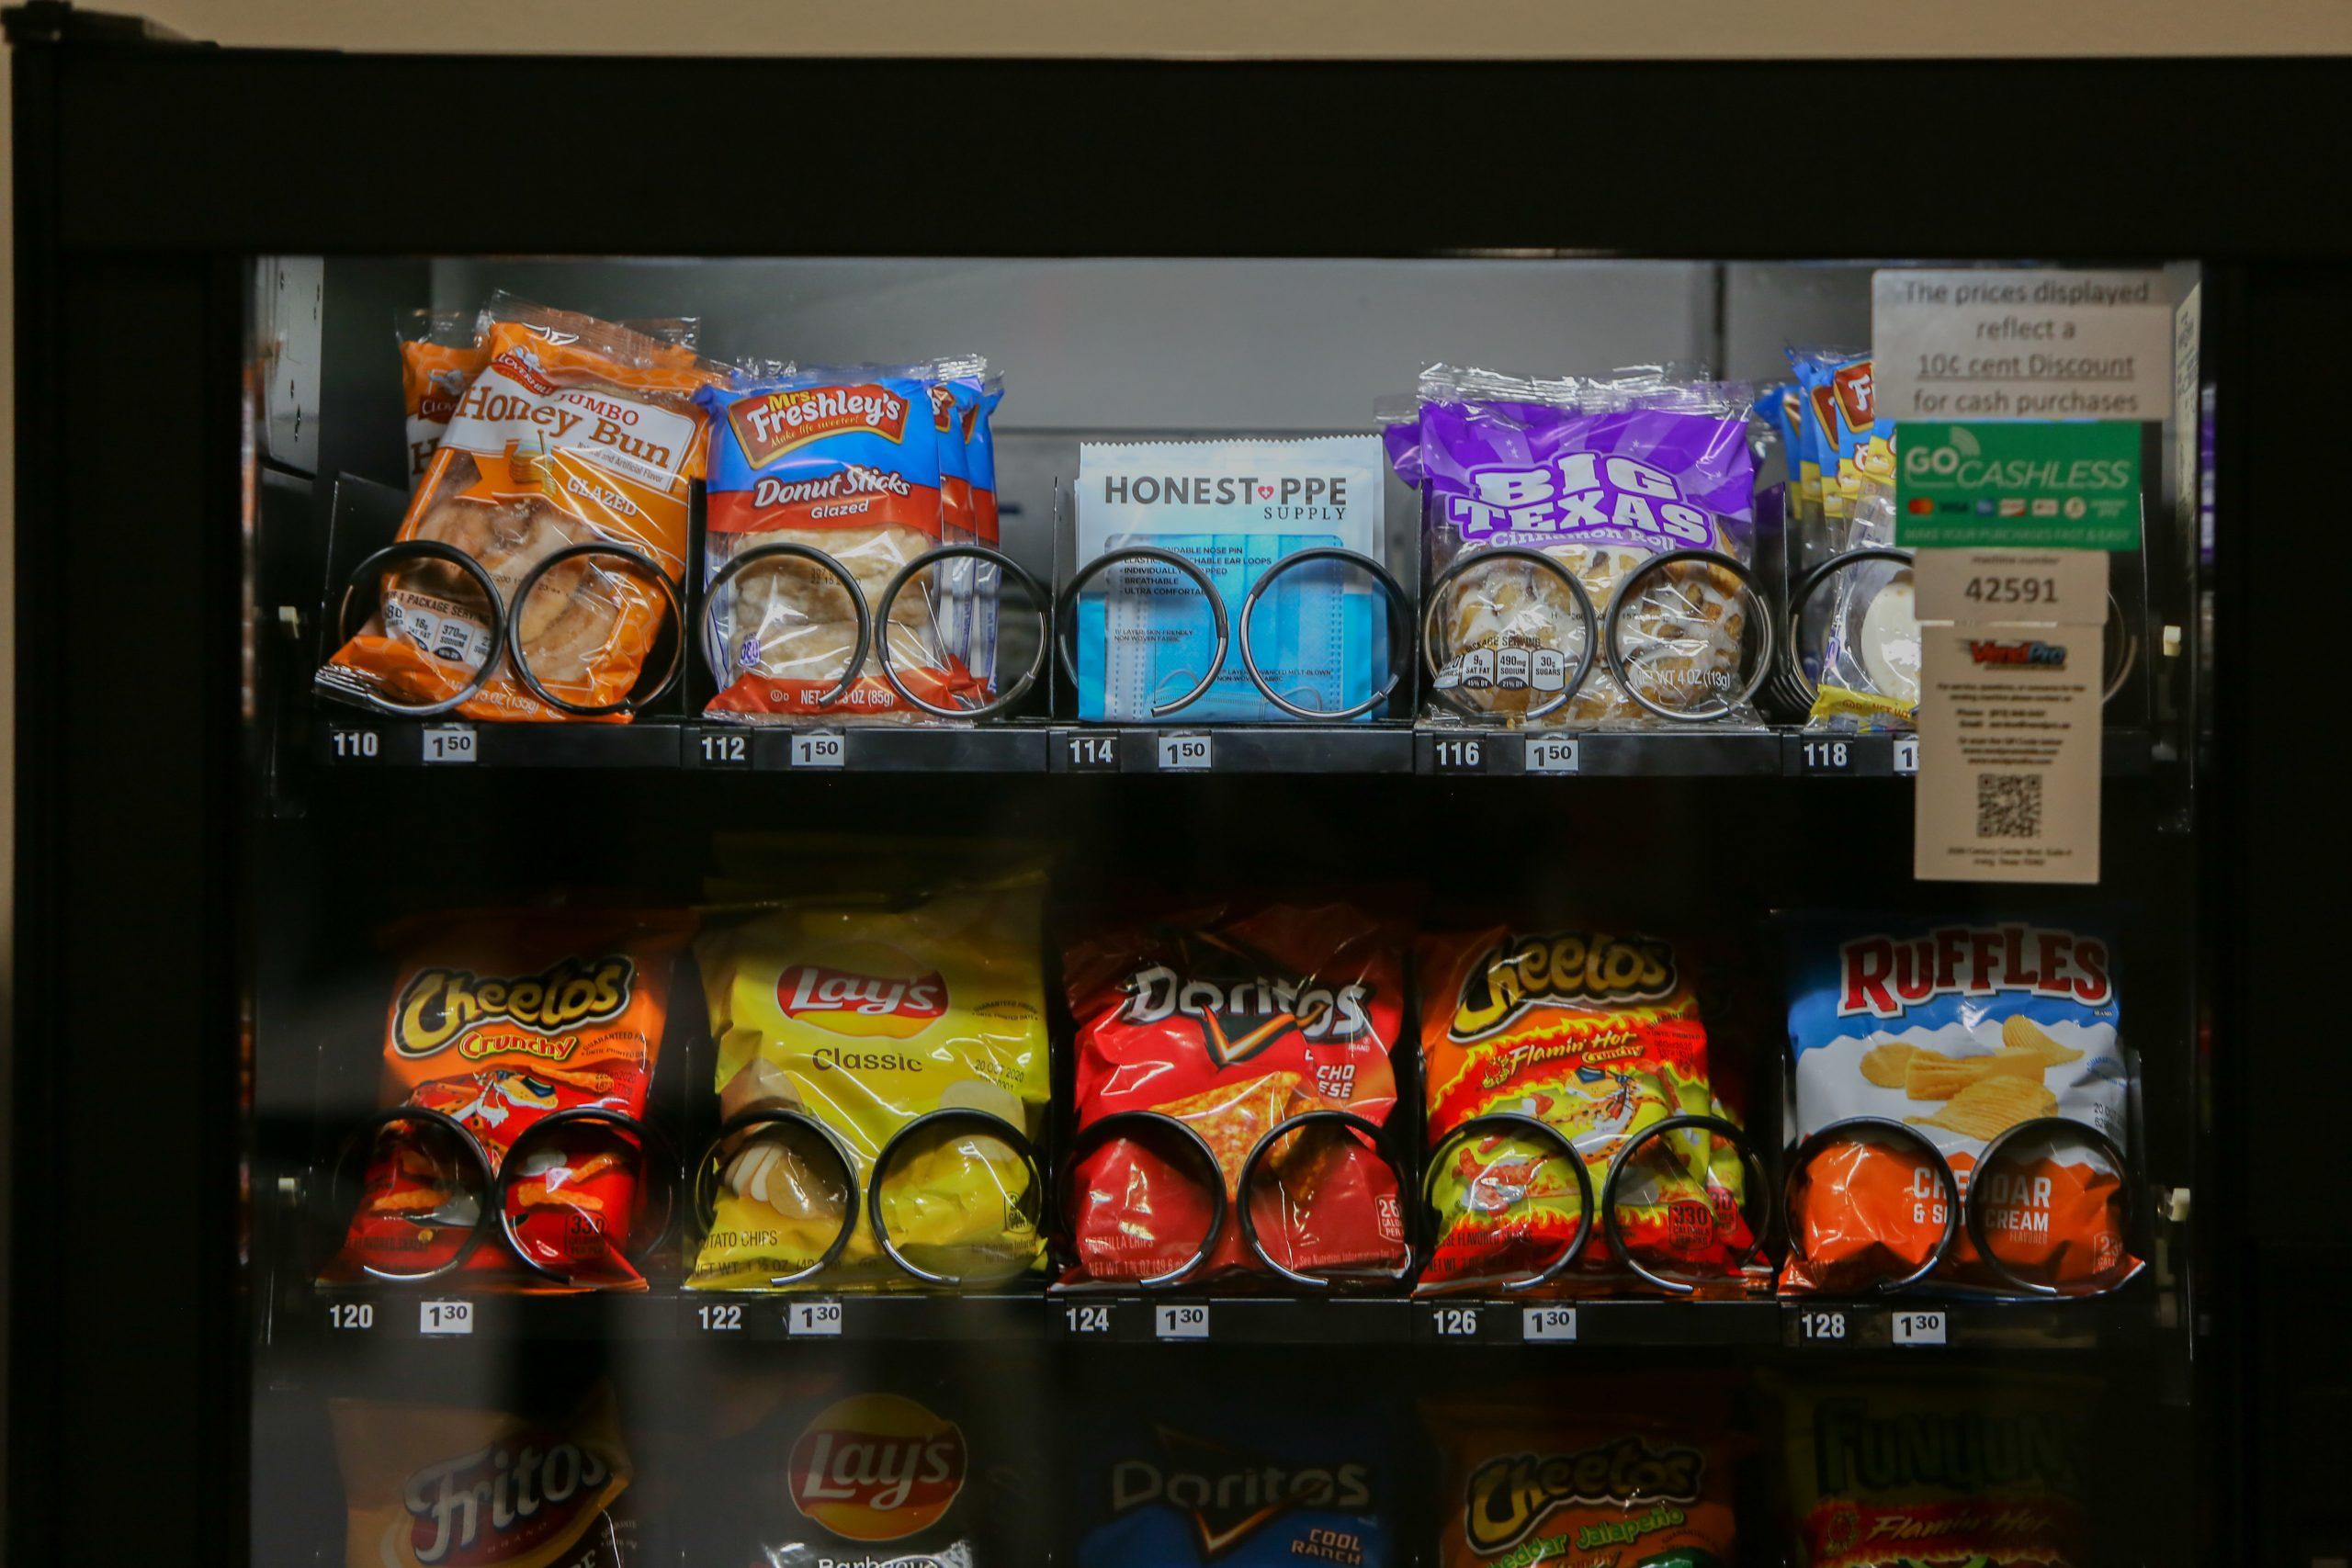 Vending machines offer disposable face masks